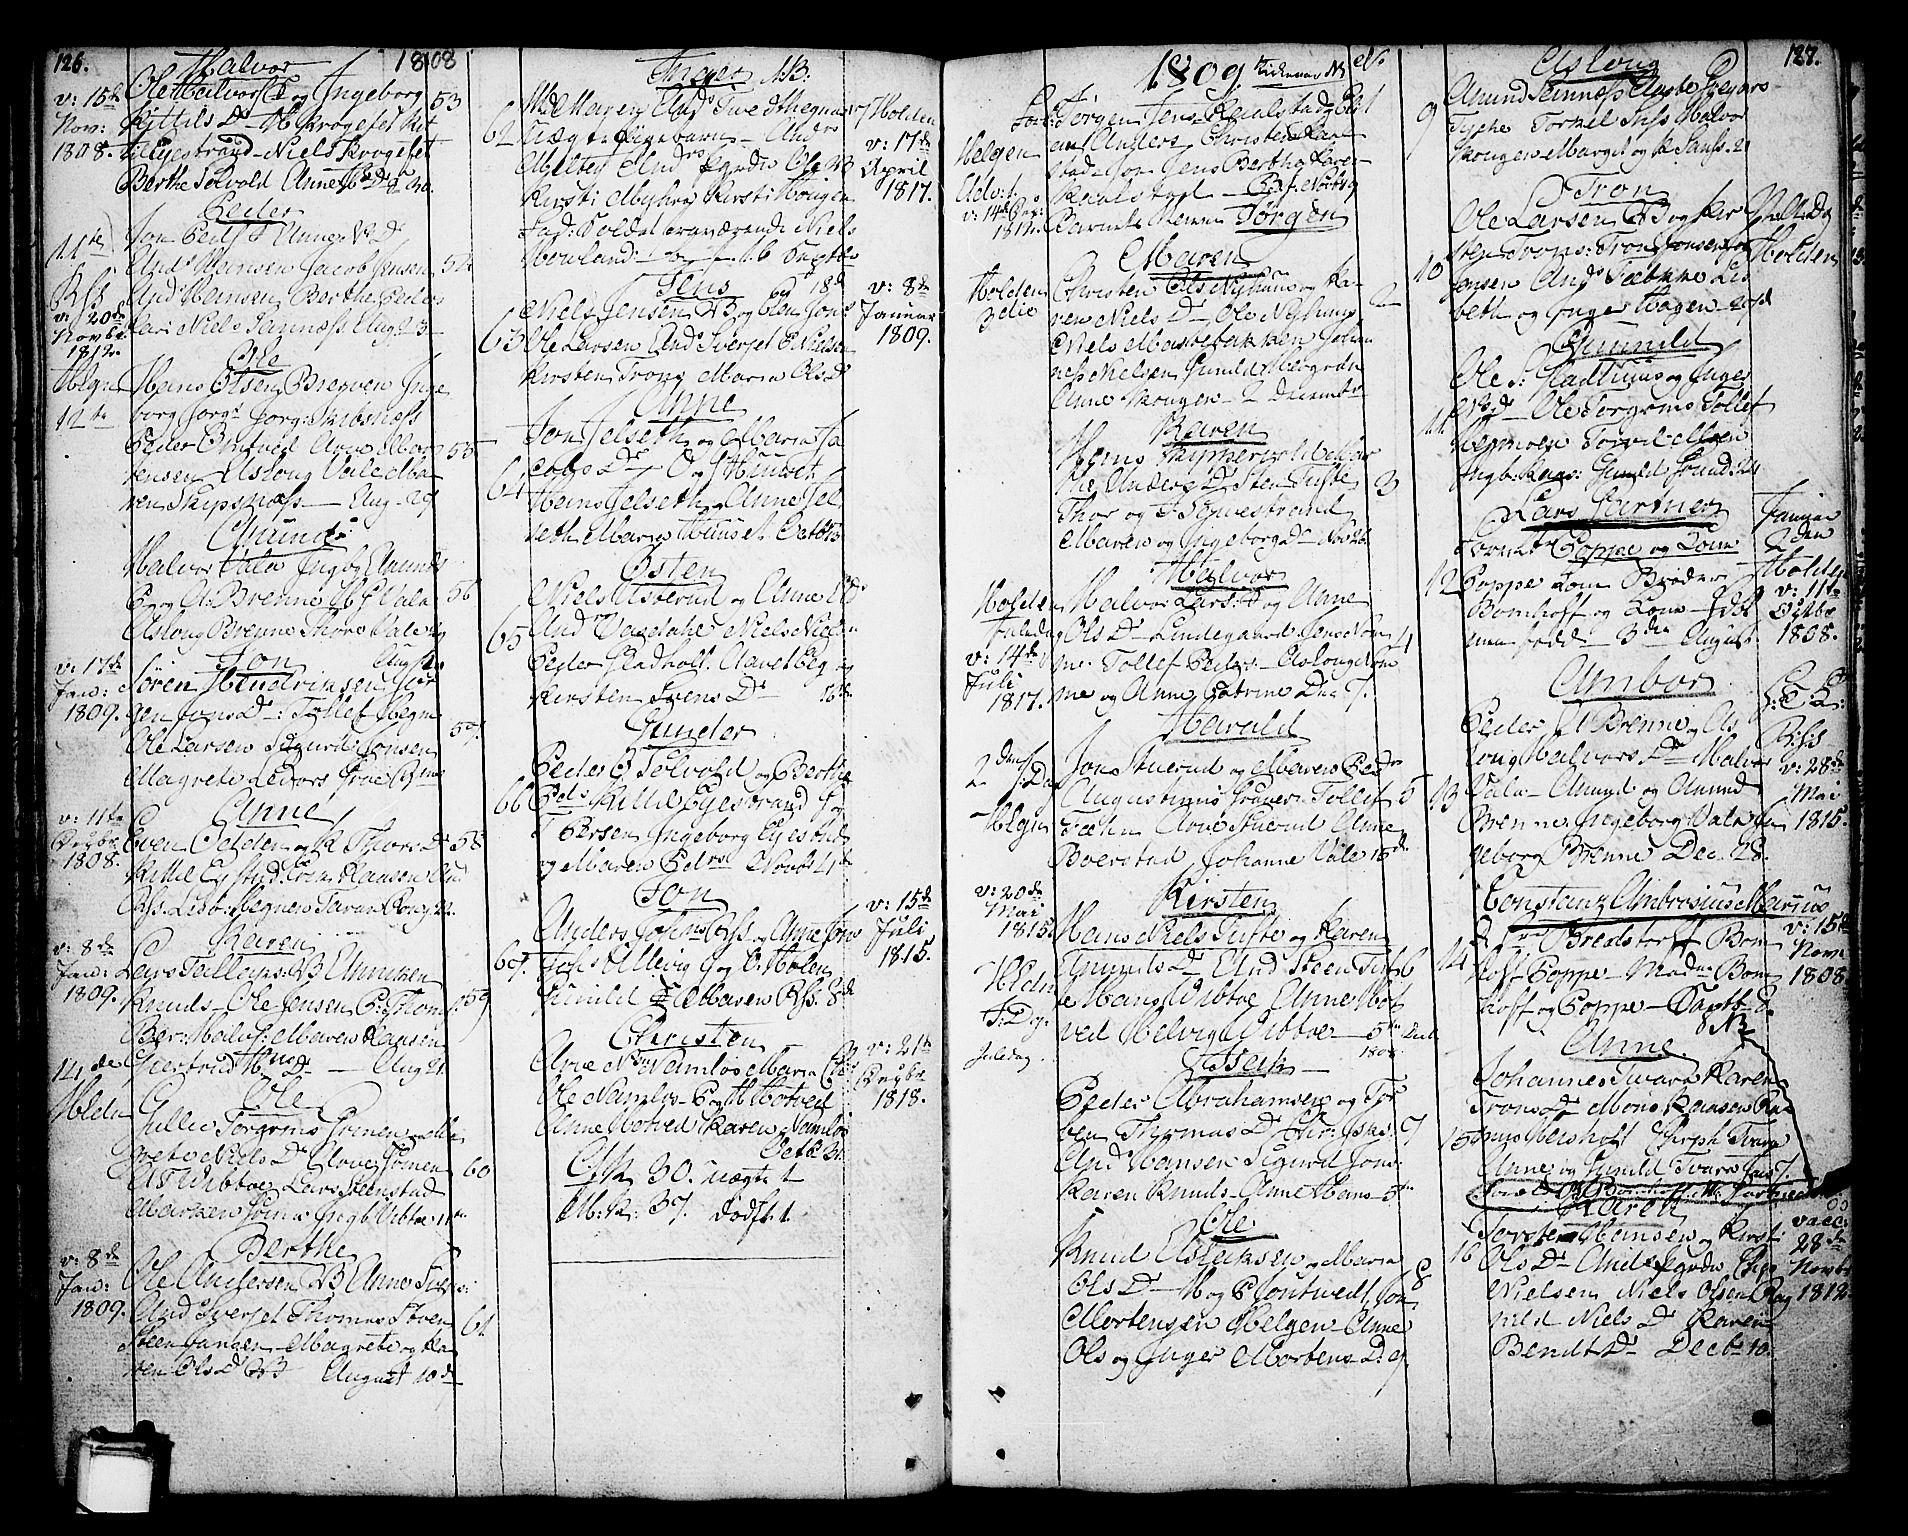 SAKO, Holla kirkebøker, F/Fa/L0002: Ministerialbok nr. 2, 1779-1814, s. 126-127